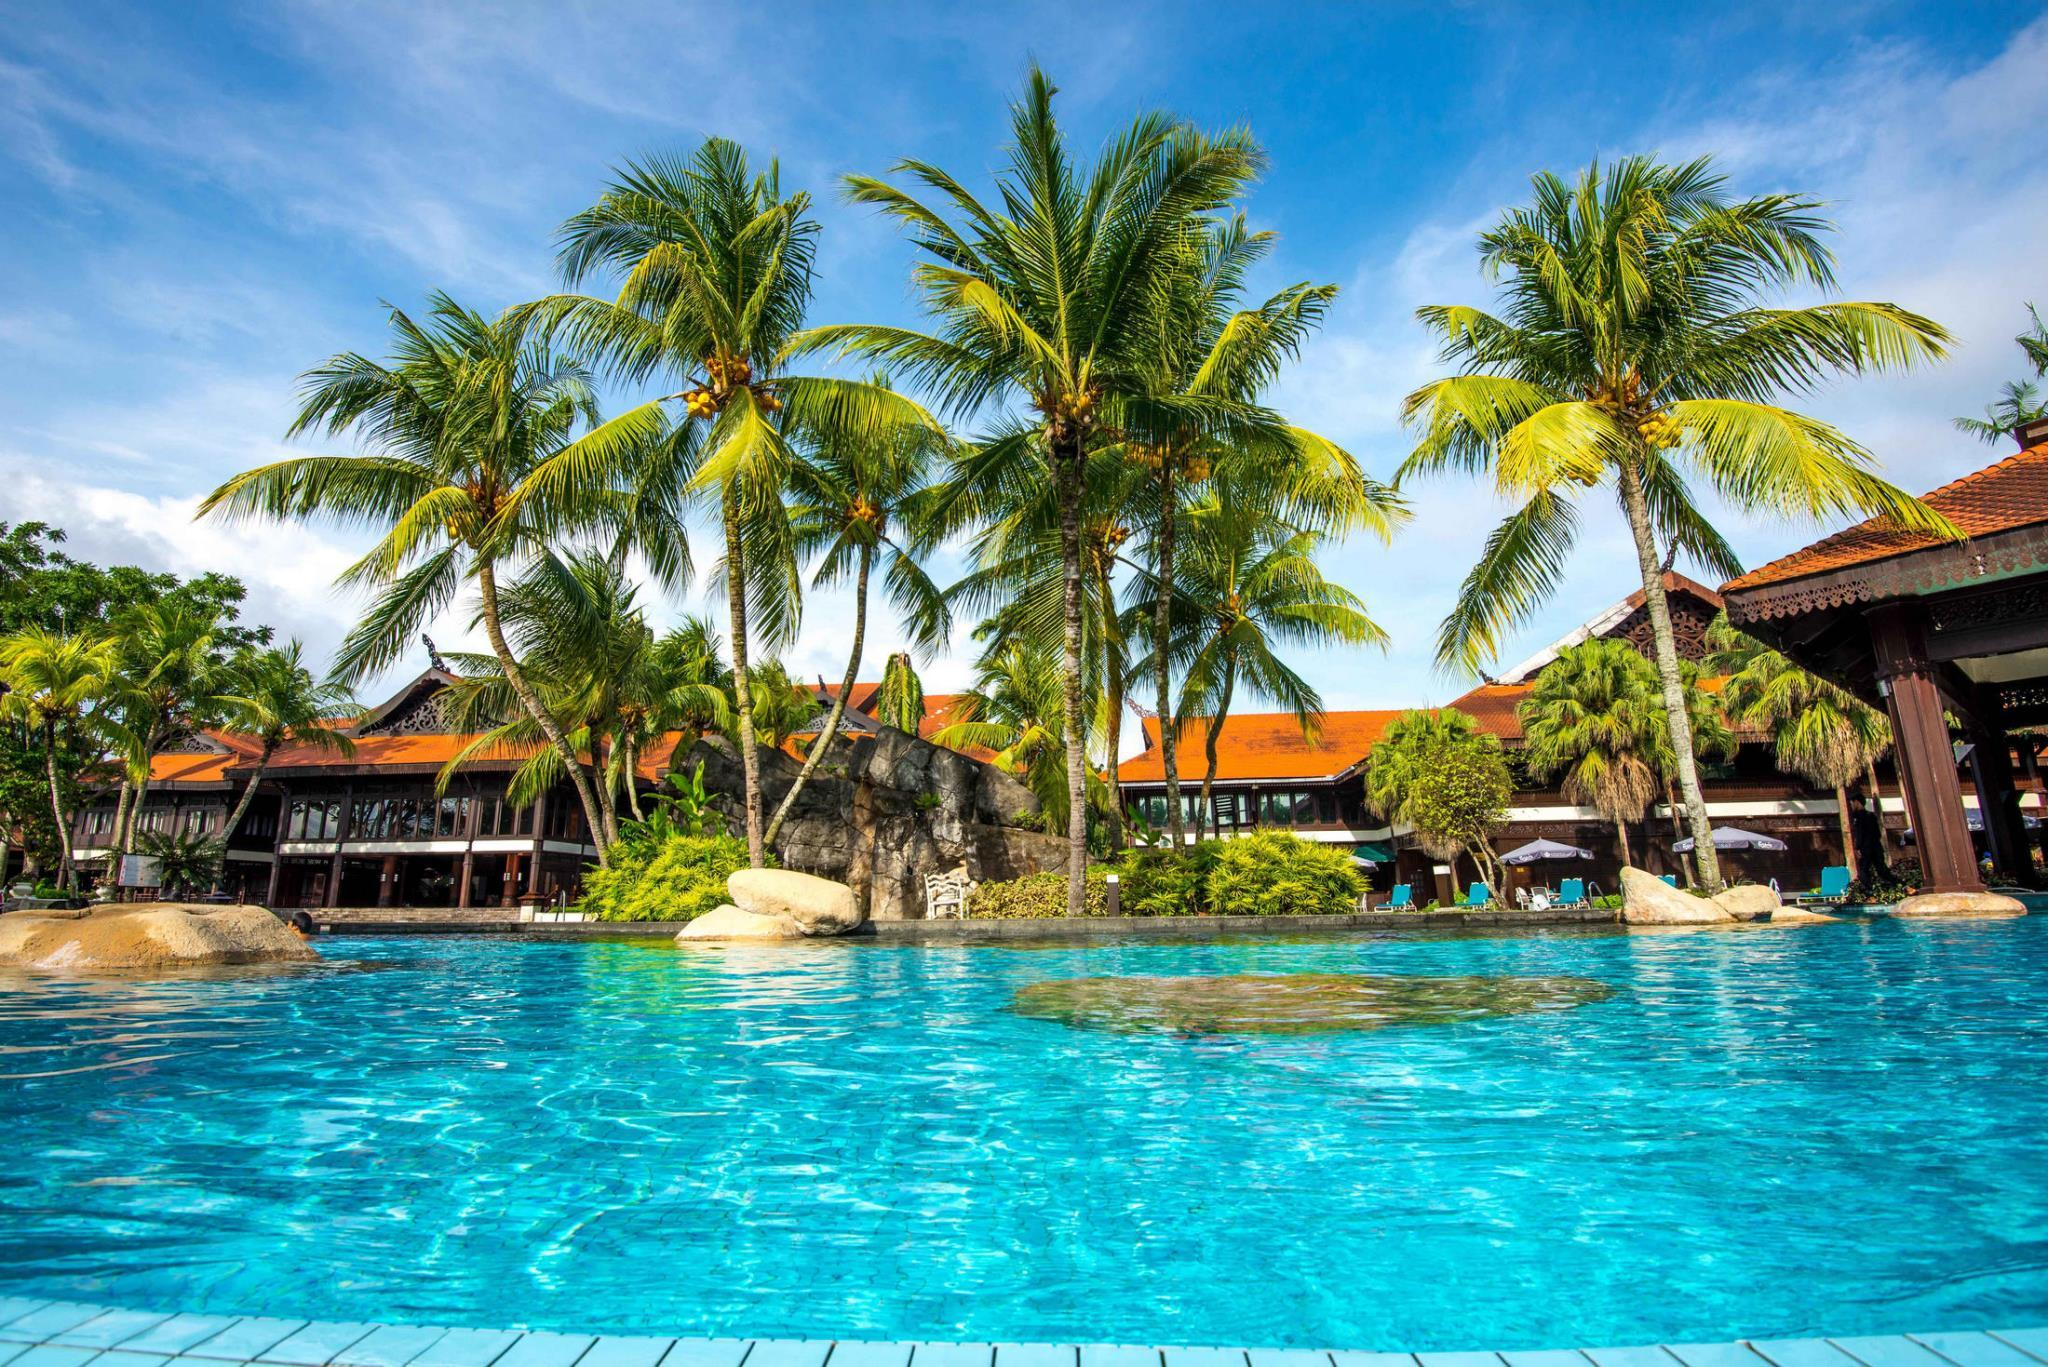 Pulai springs resort johor bahru hotels villas malaysia information hotel reservations Public swimming pool in johor bahru